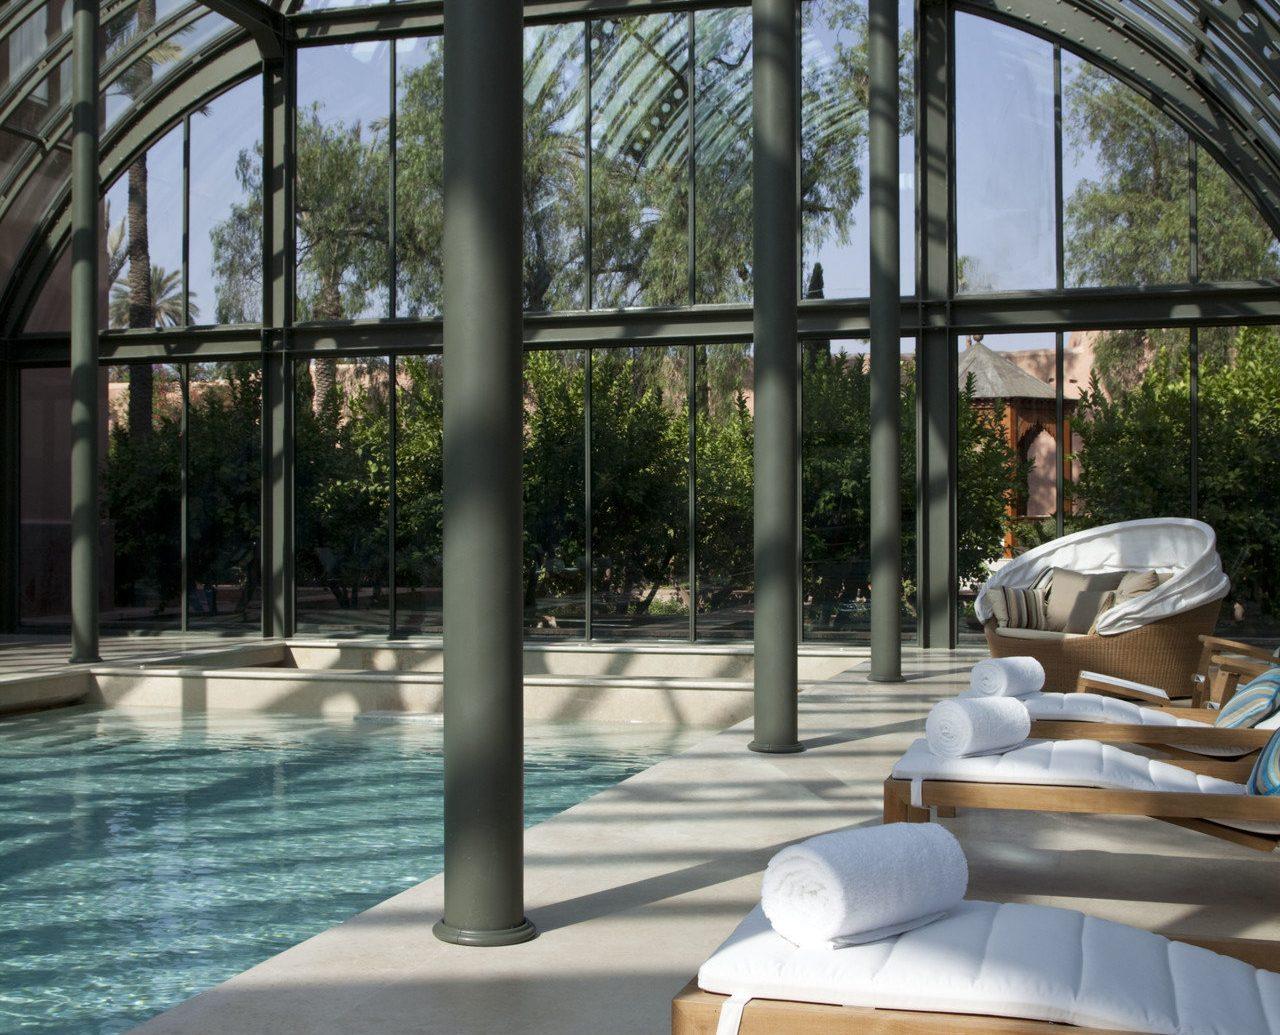 Health + Wellness Hotels Spa Retreats indoor swimming pool Architecture estate home outdoor structure interior design Resort backyard porch window furniture